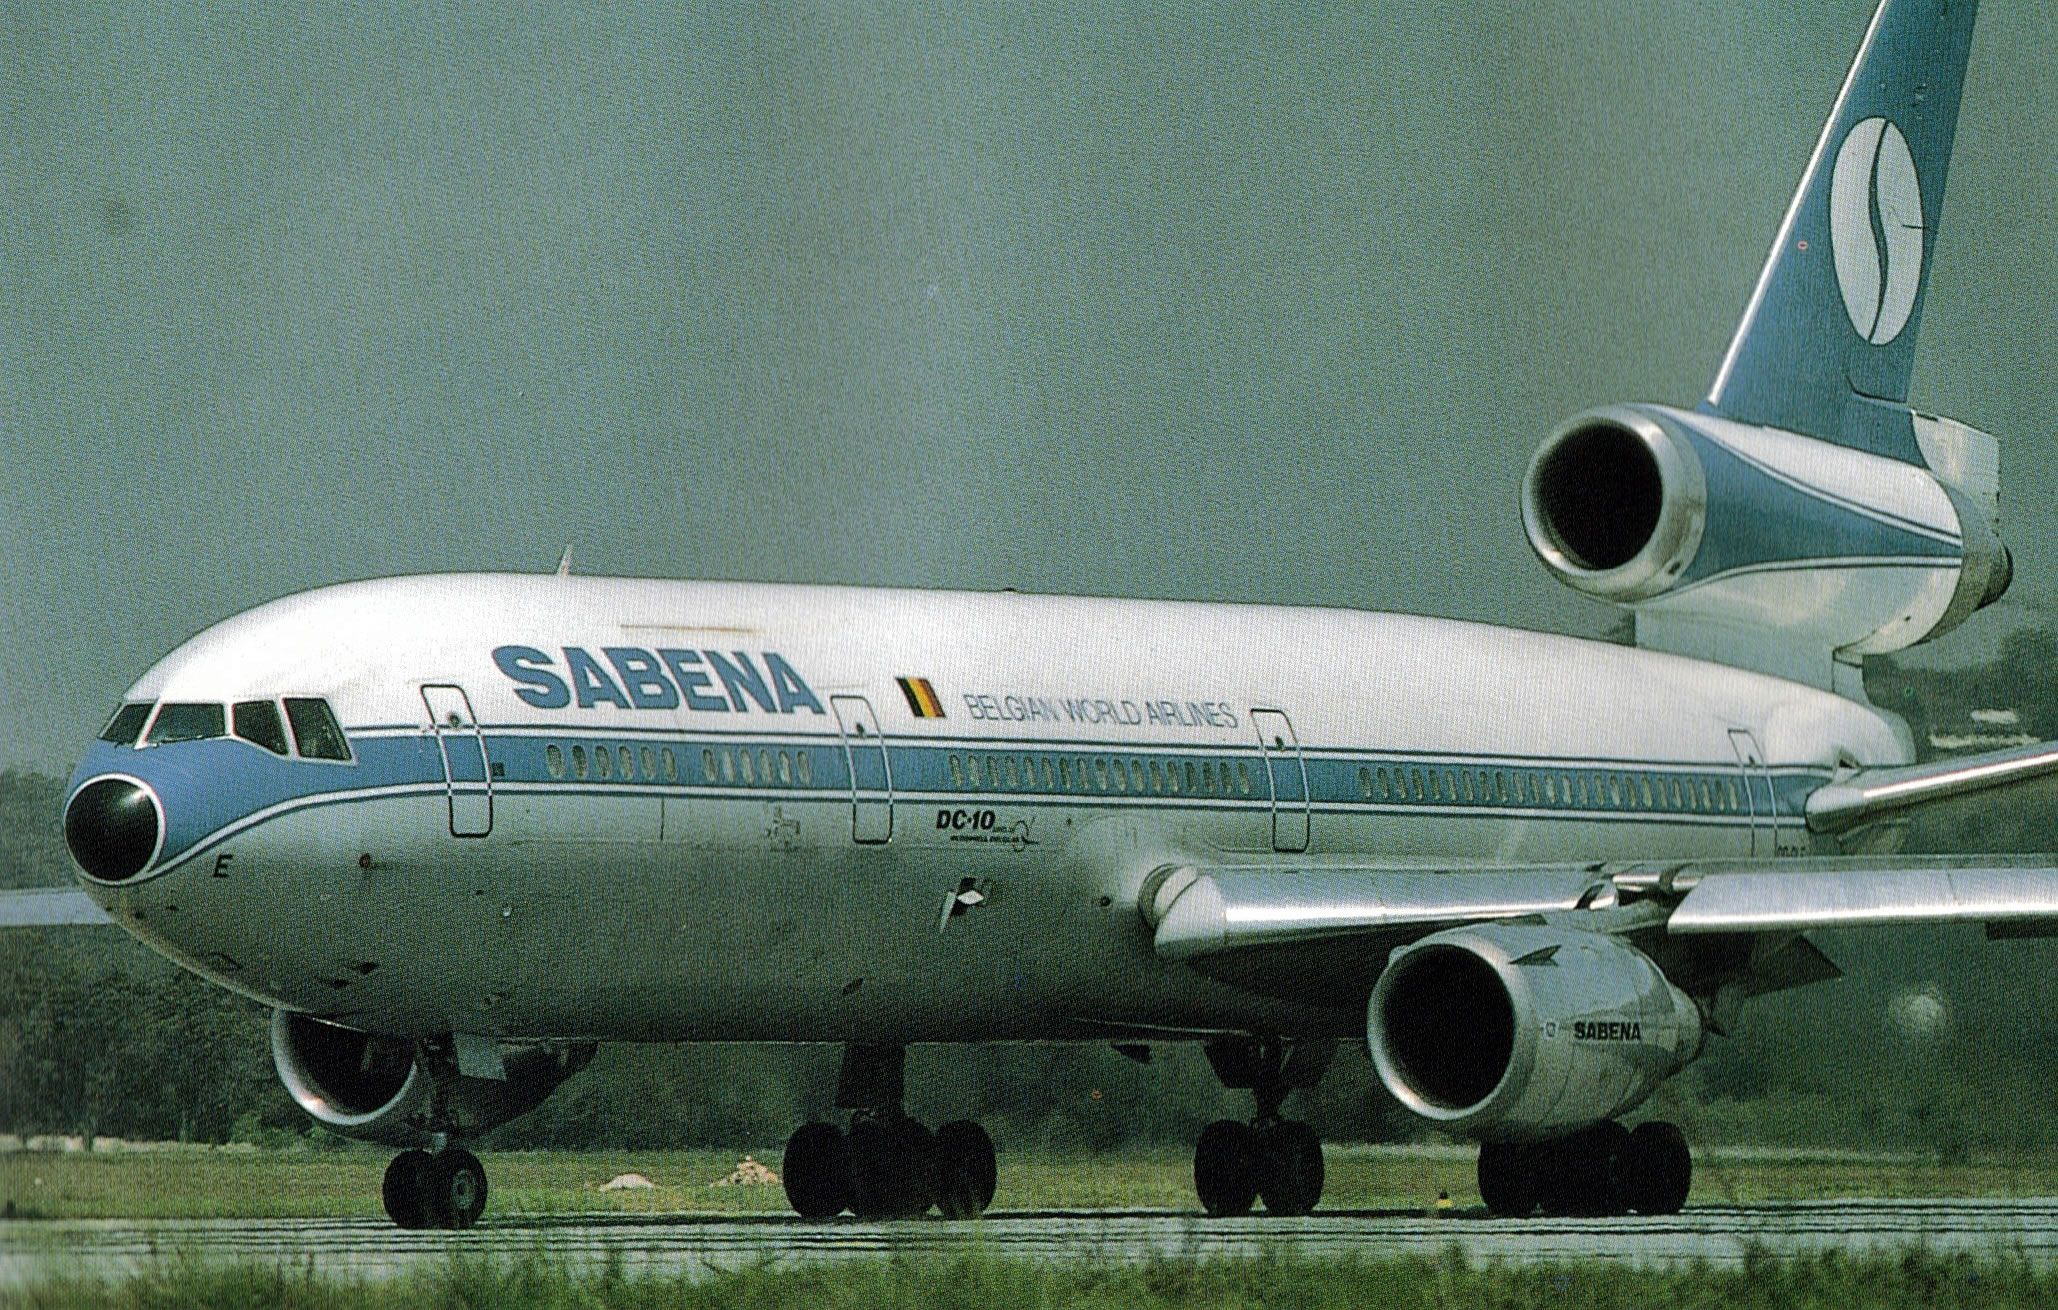 Sabena Belgian World Airways McDonnell-Douglas DC-10-30   All ...